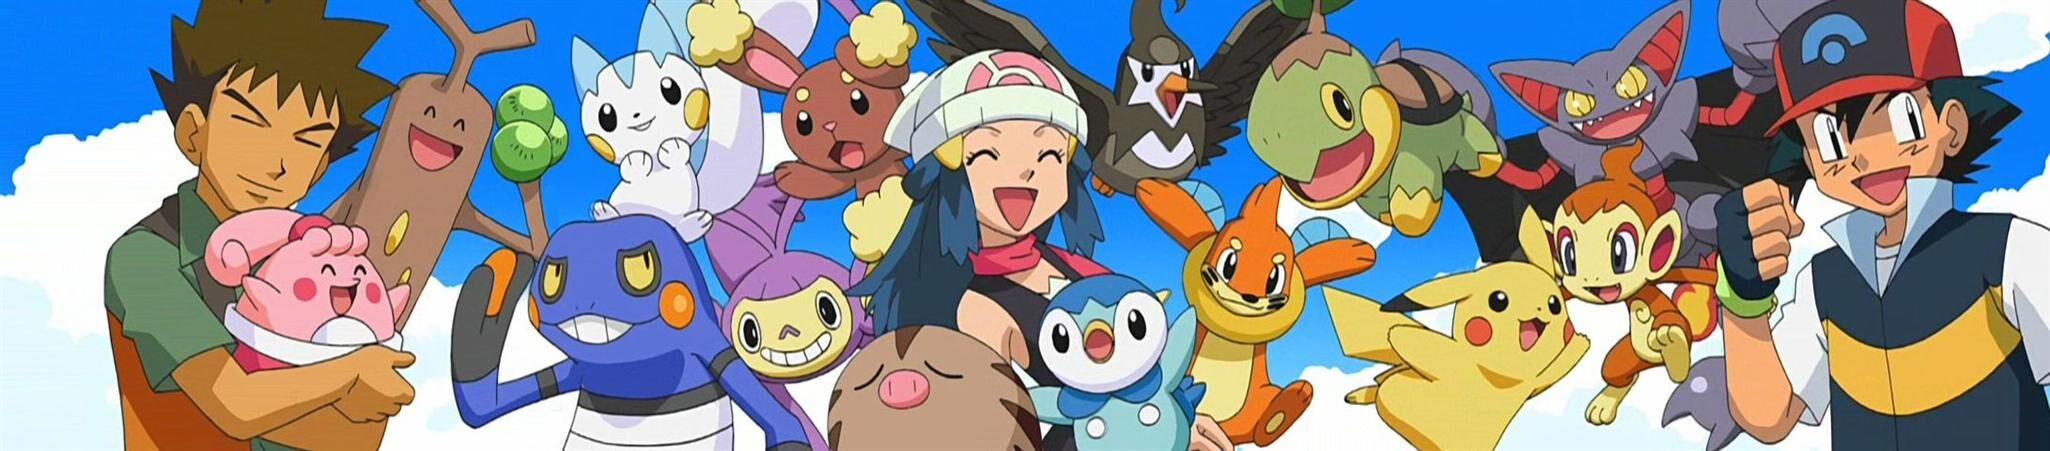 Ash & Friends.jpg